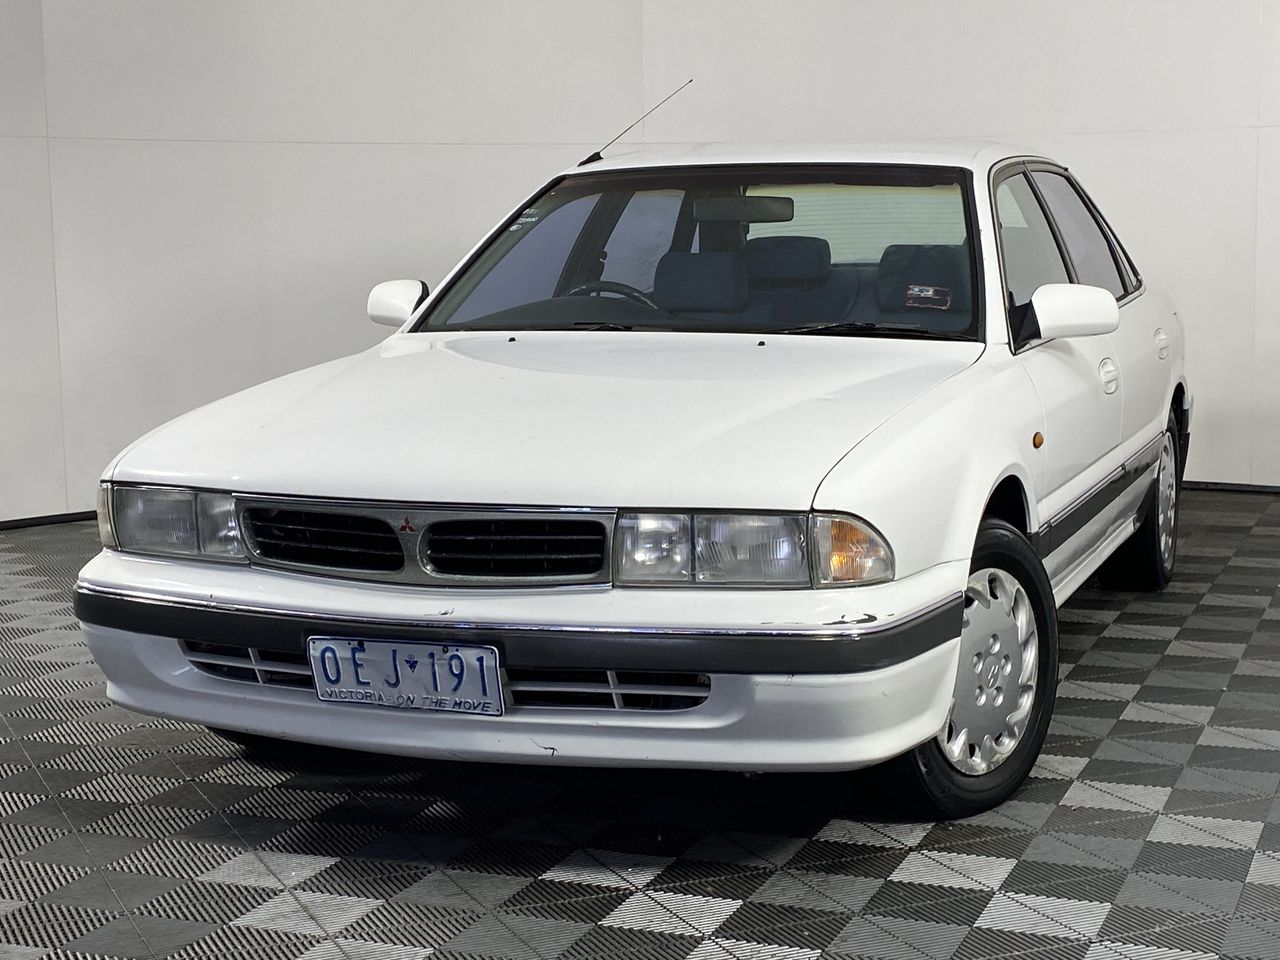 1996 Mitsubishi Magna SE TS Automatic Sedan